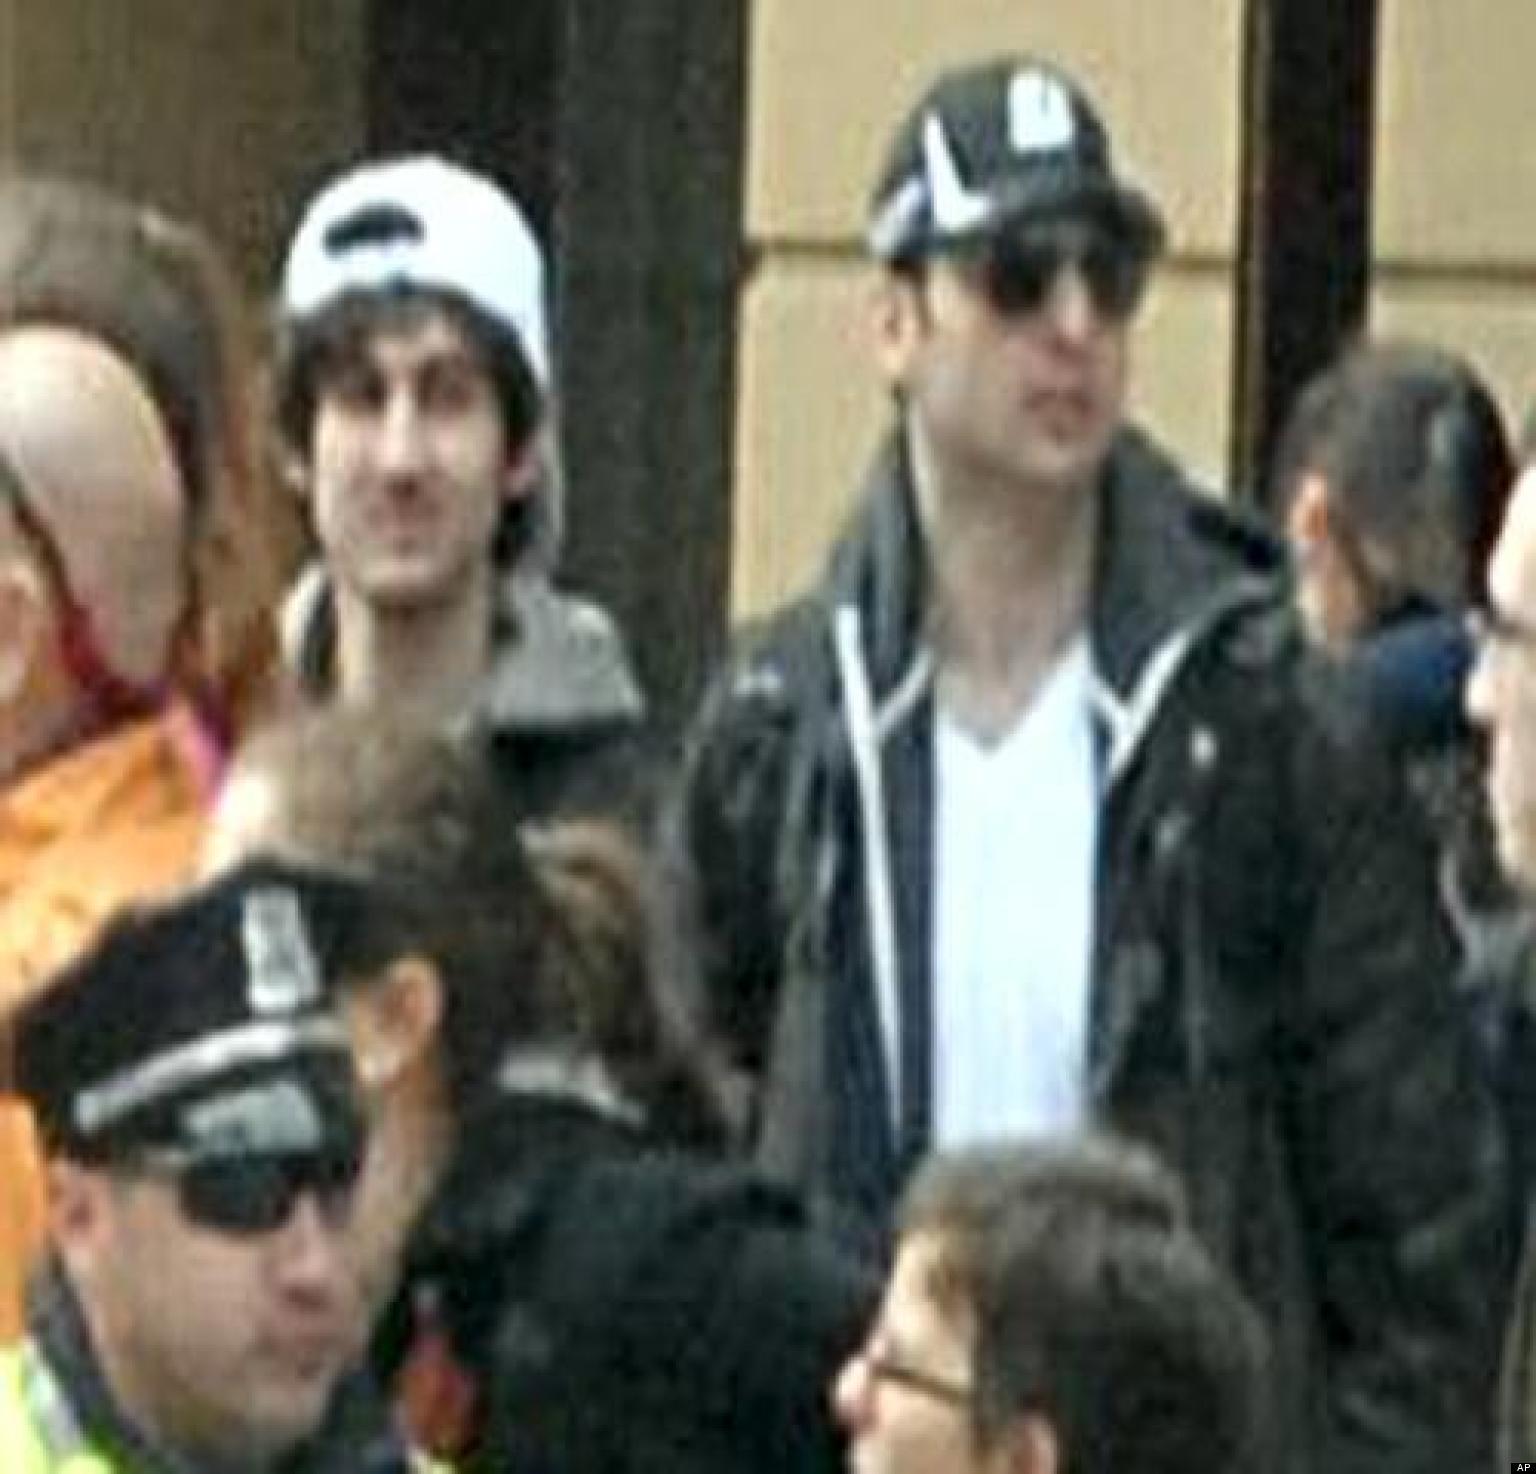 Boston Bombing Suspect Thought To Be Dzhokhar A Tsarnaev: Dzhokhar Tsarnaev And Tamerlan Tsarnaev -- Story Of Boston